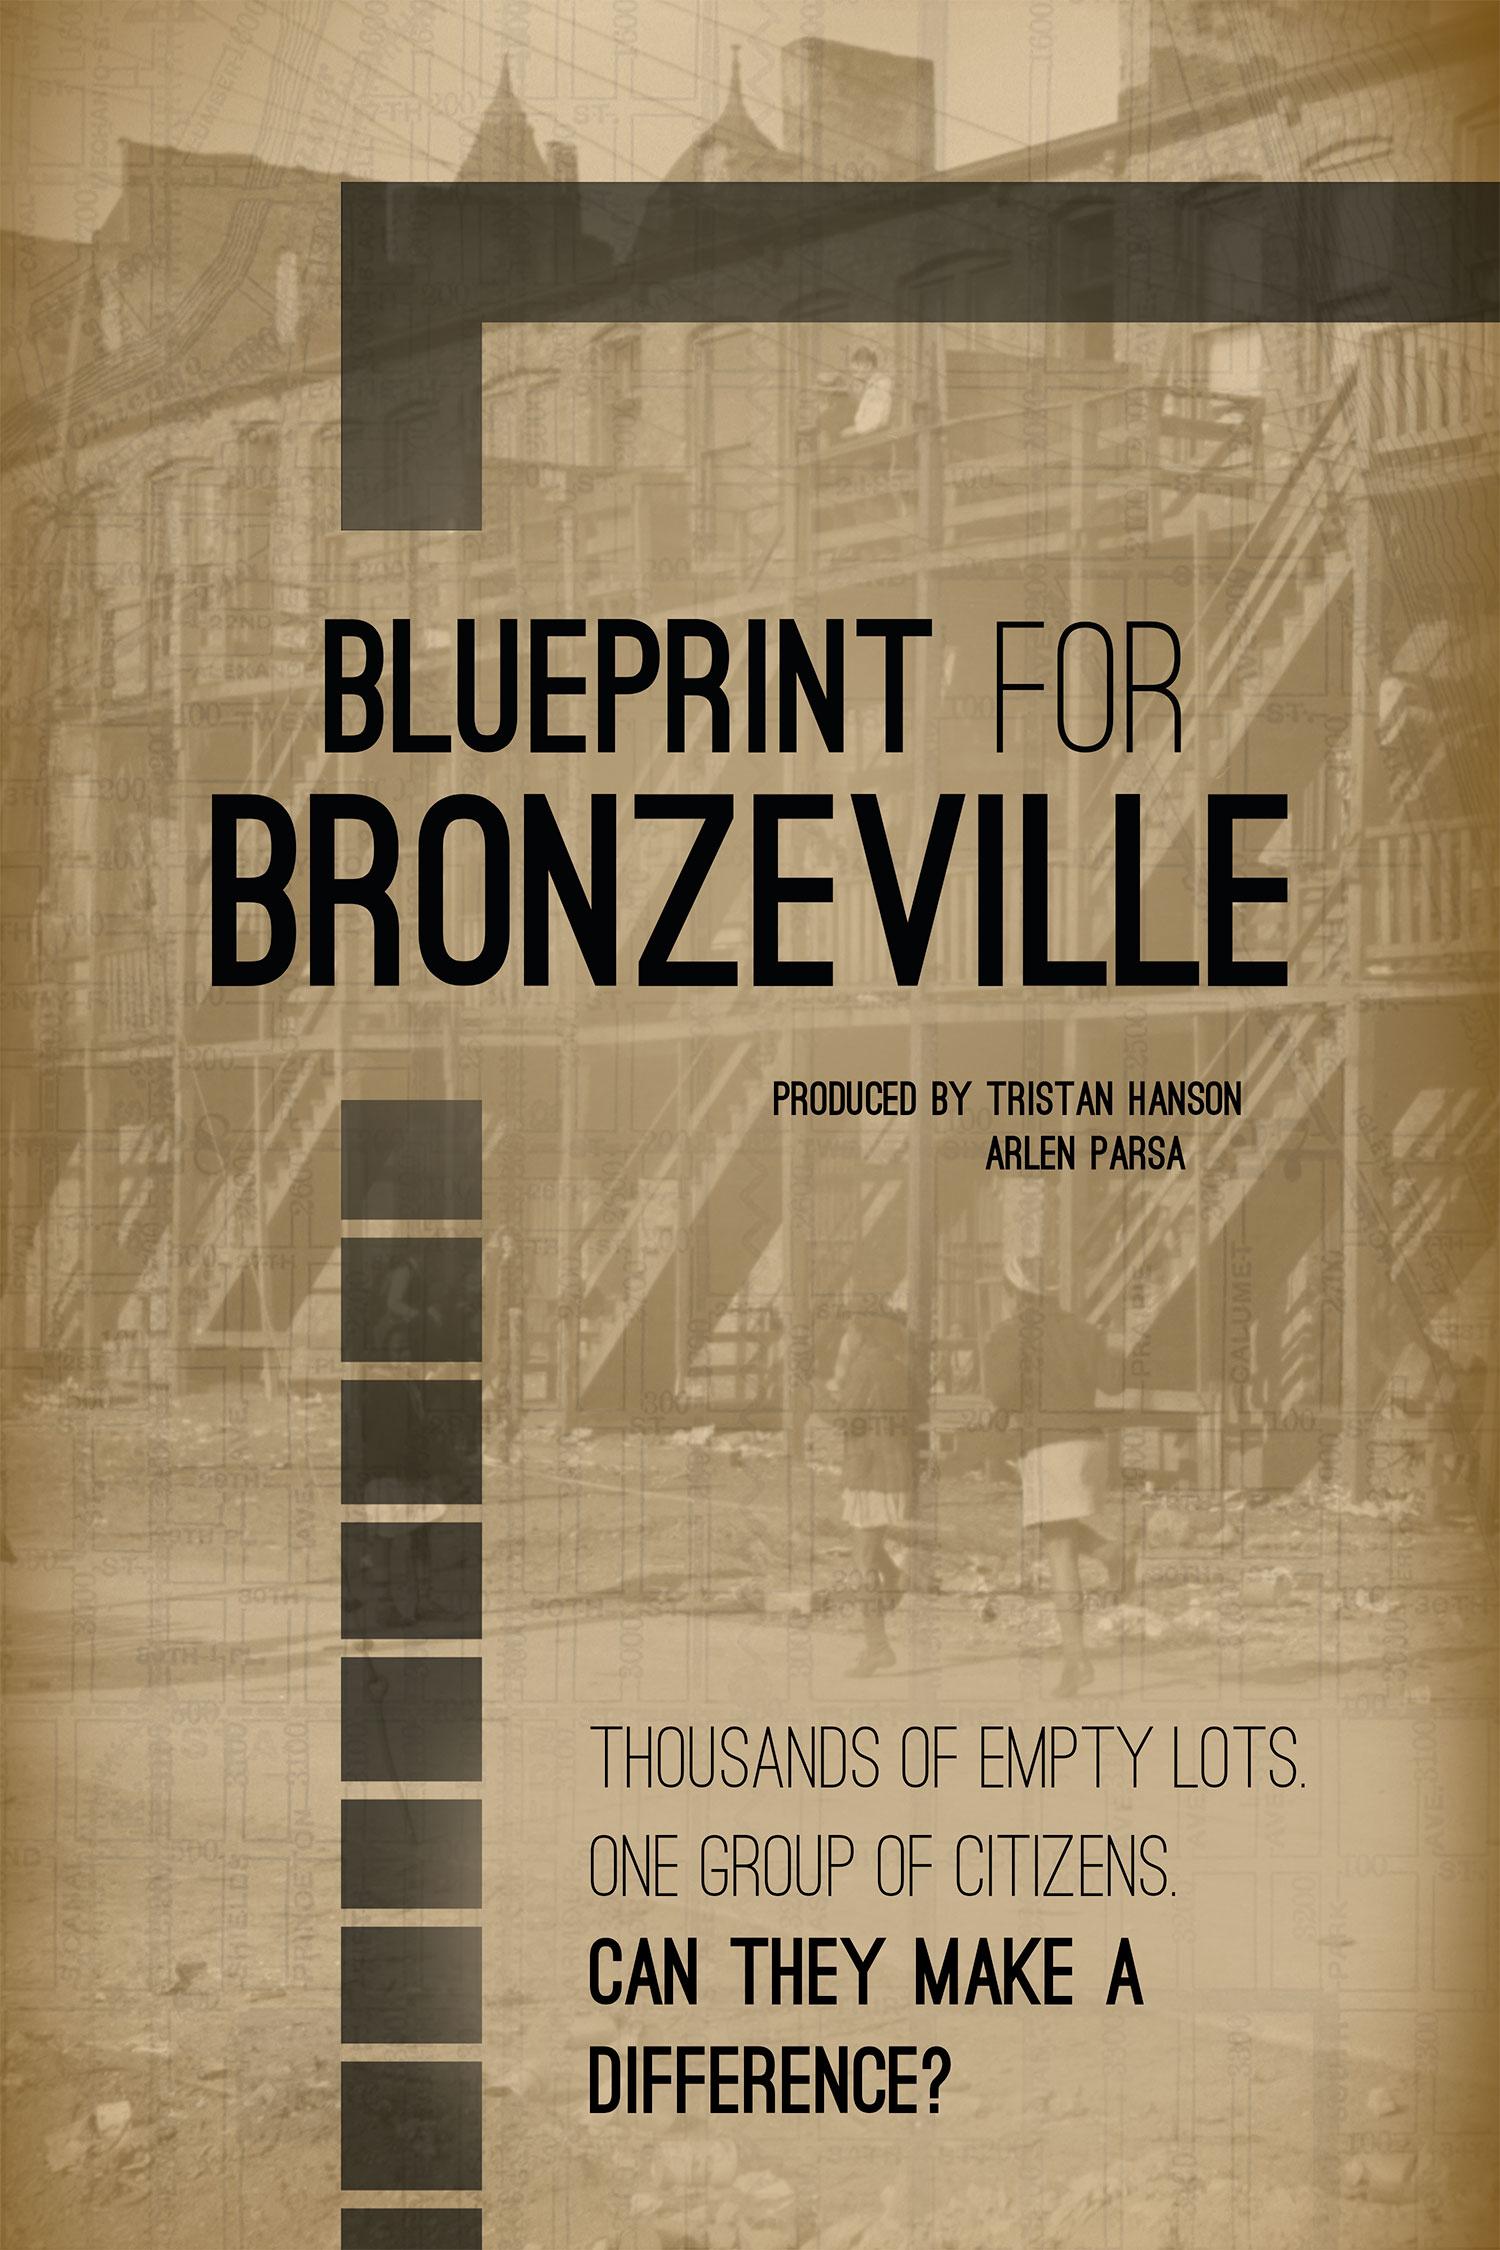 Blueprint for bronzeville 2017 imdb malvernweather Choice Image